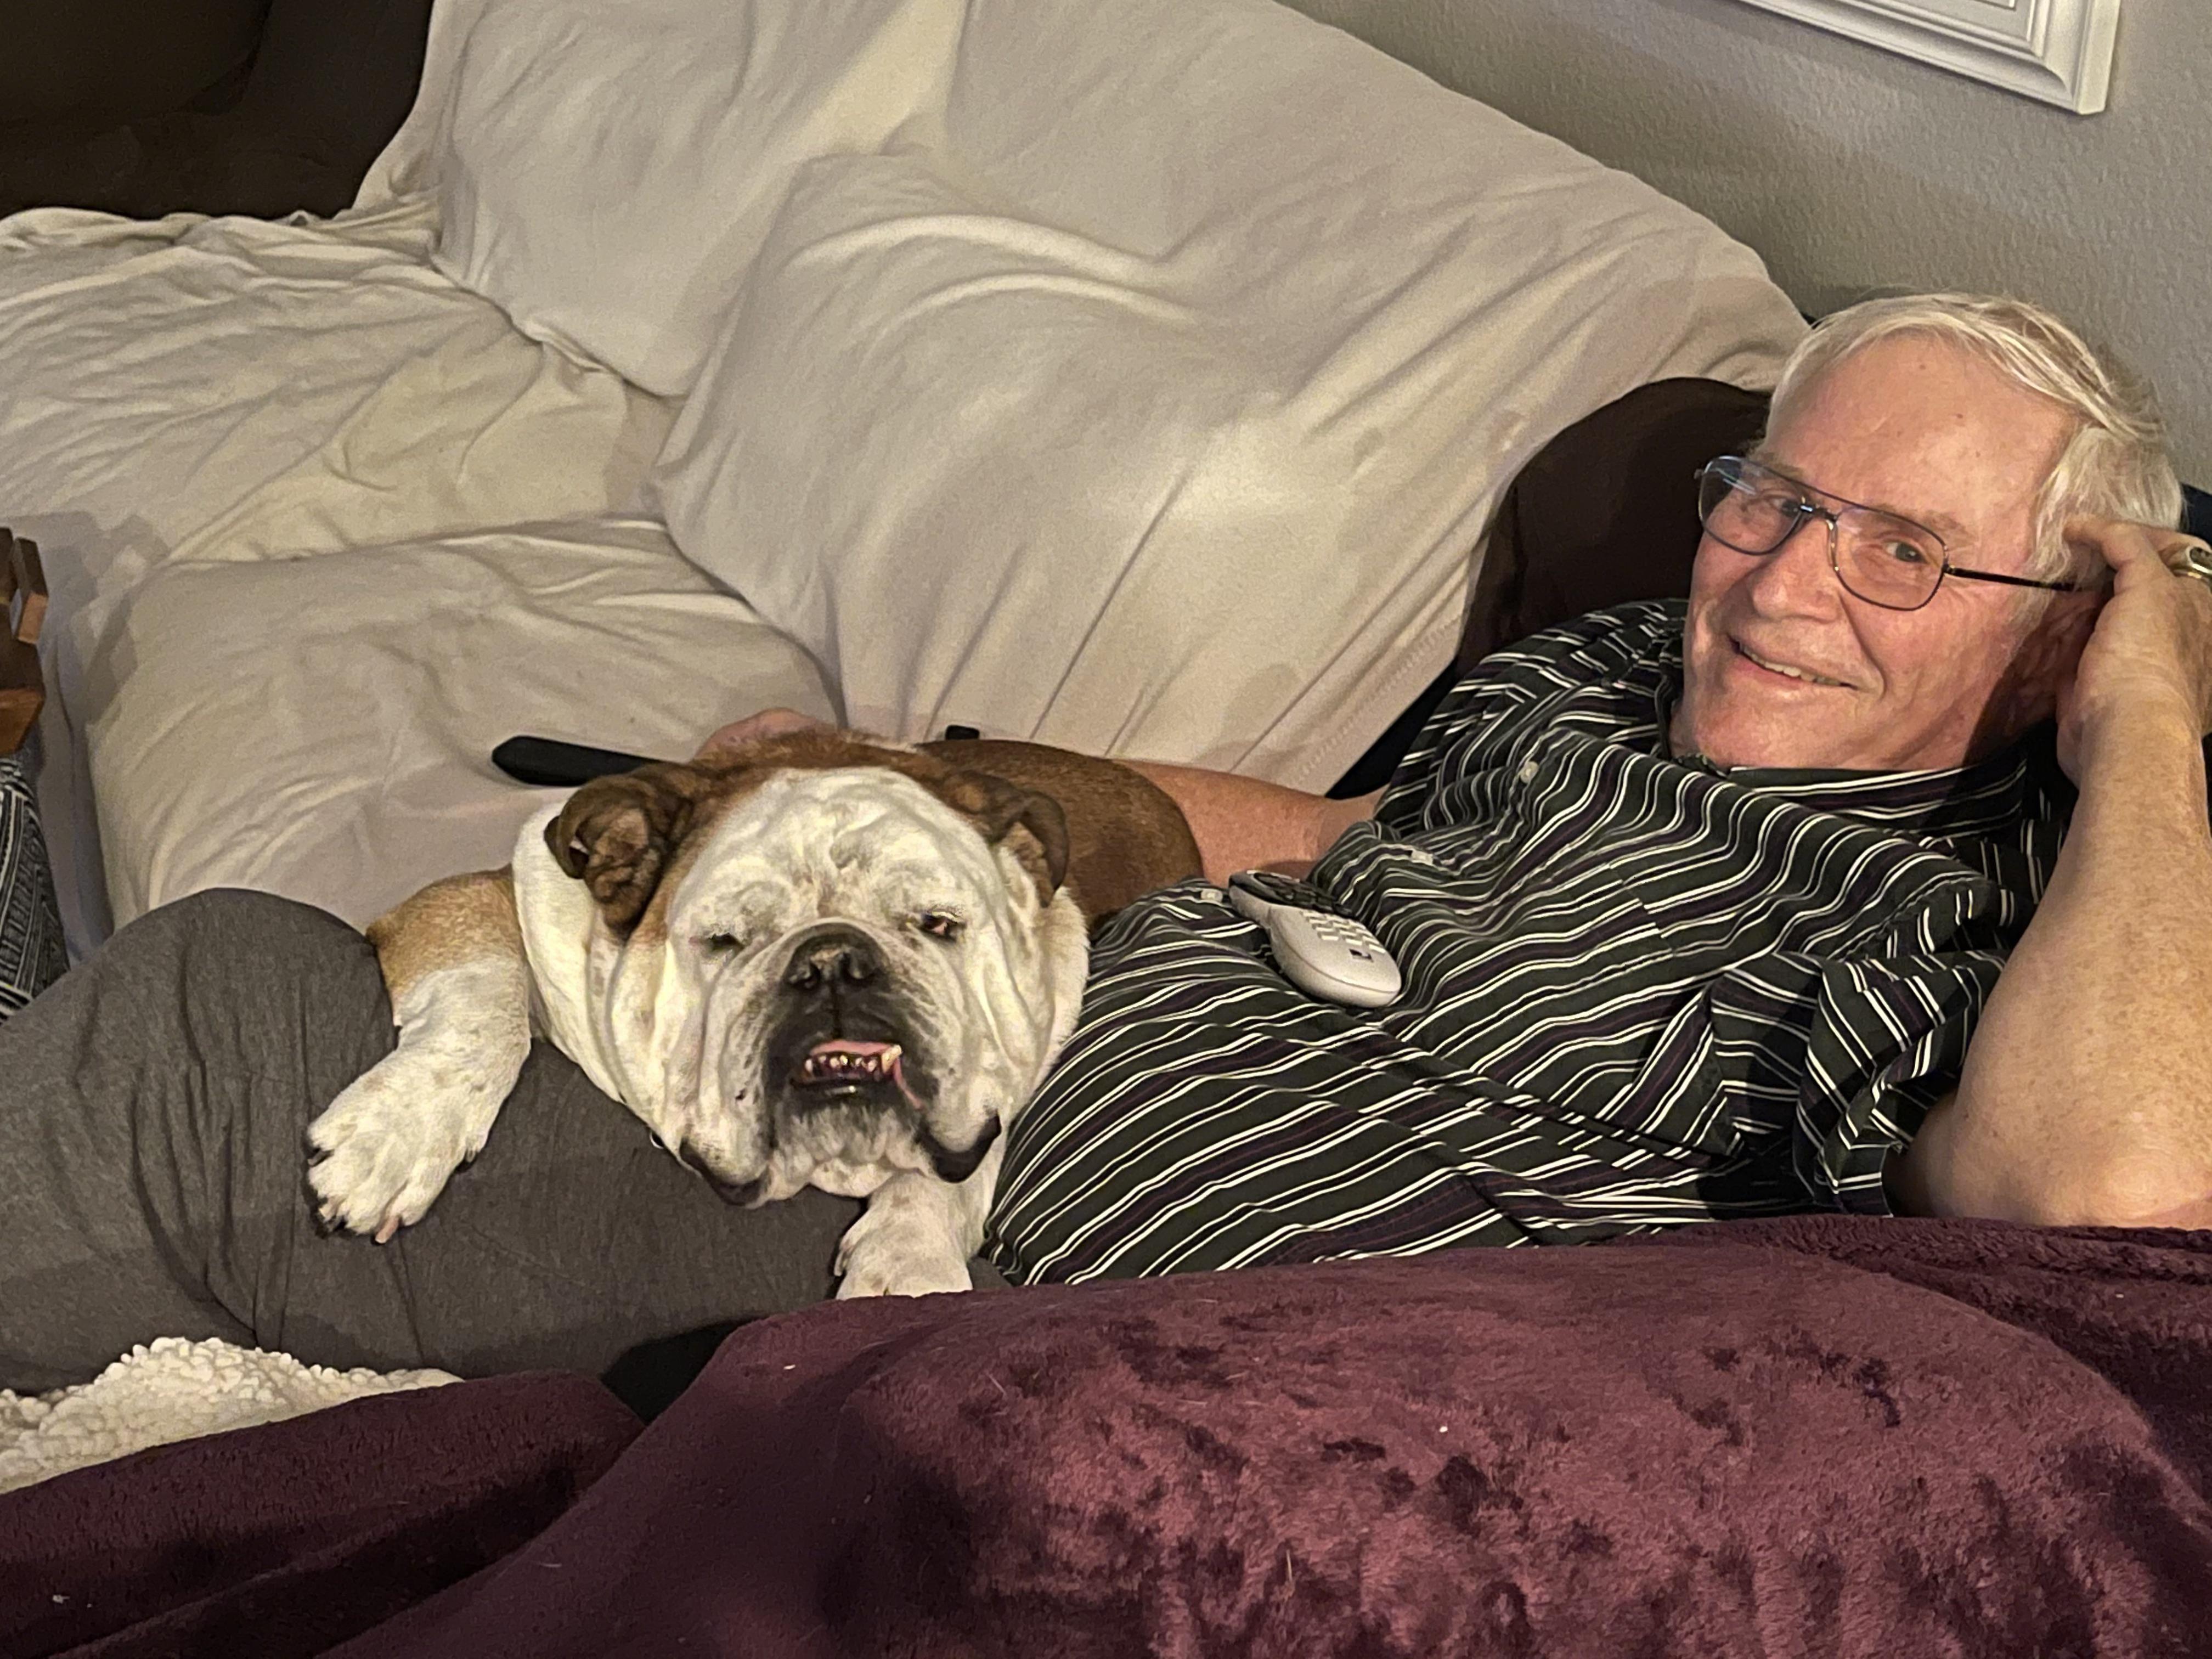 Loves it when Grandpa visits ❤️